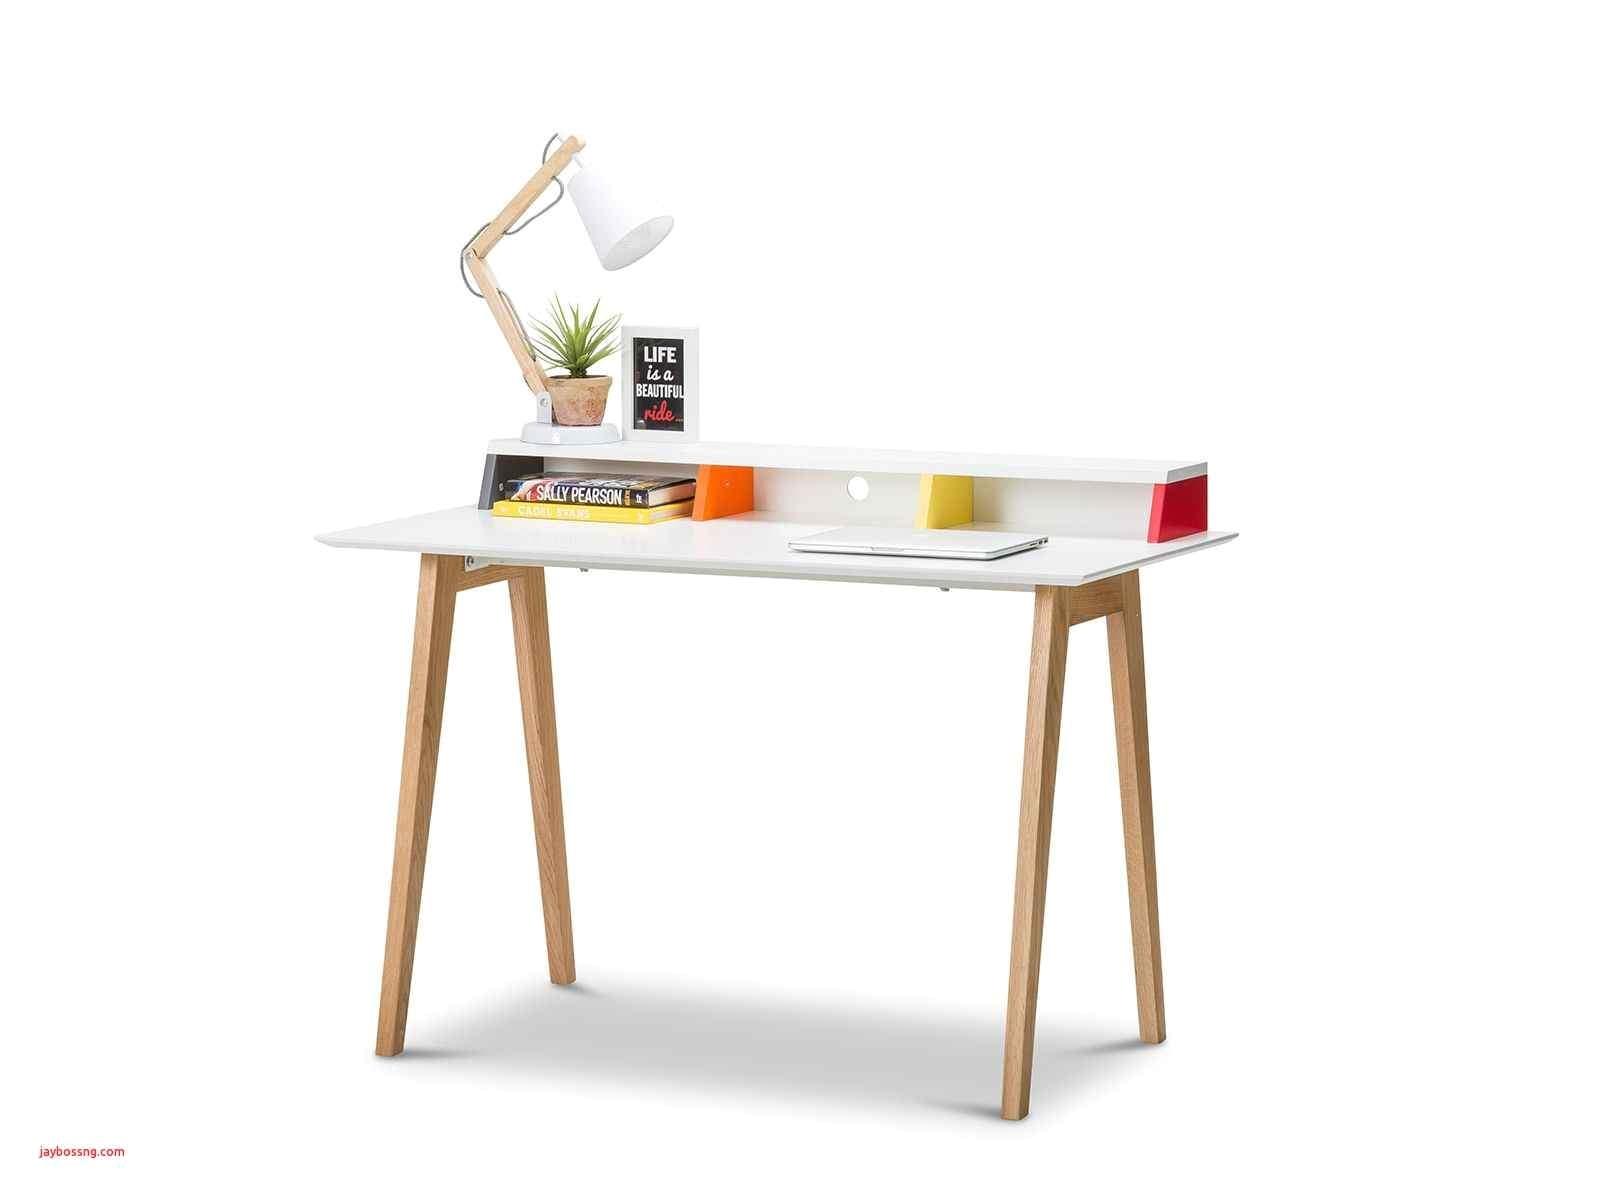 Kmart Desk Chair Nz 23 Bedroom Furniture Precious Study Rh Bradshomefurnishings Com Fans